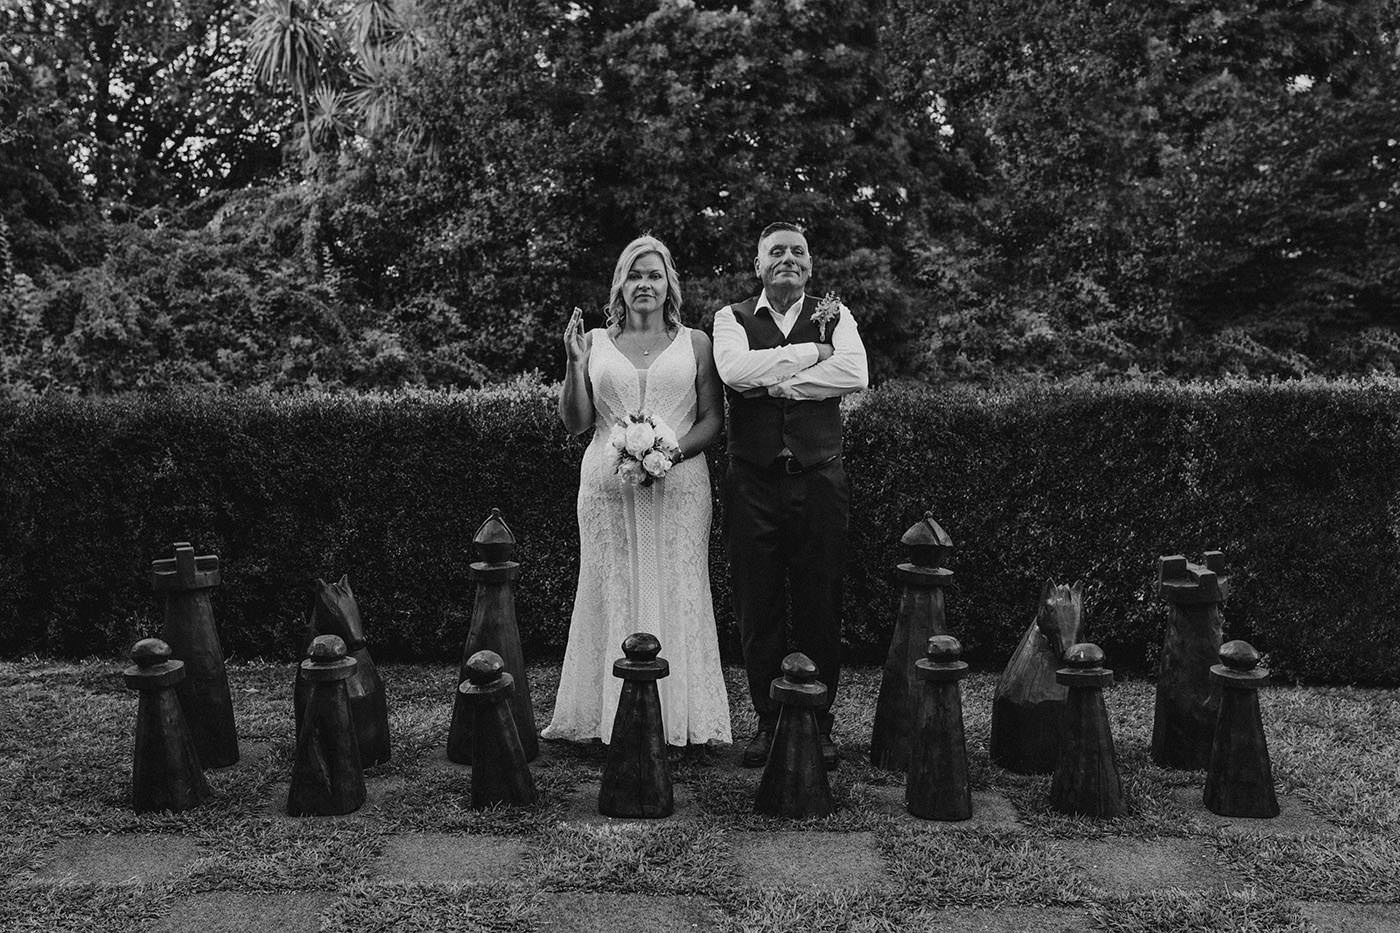 wedding_photographer_nz-00050.jpg